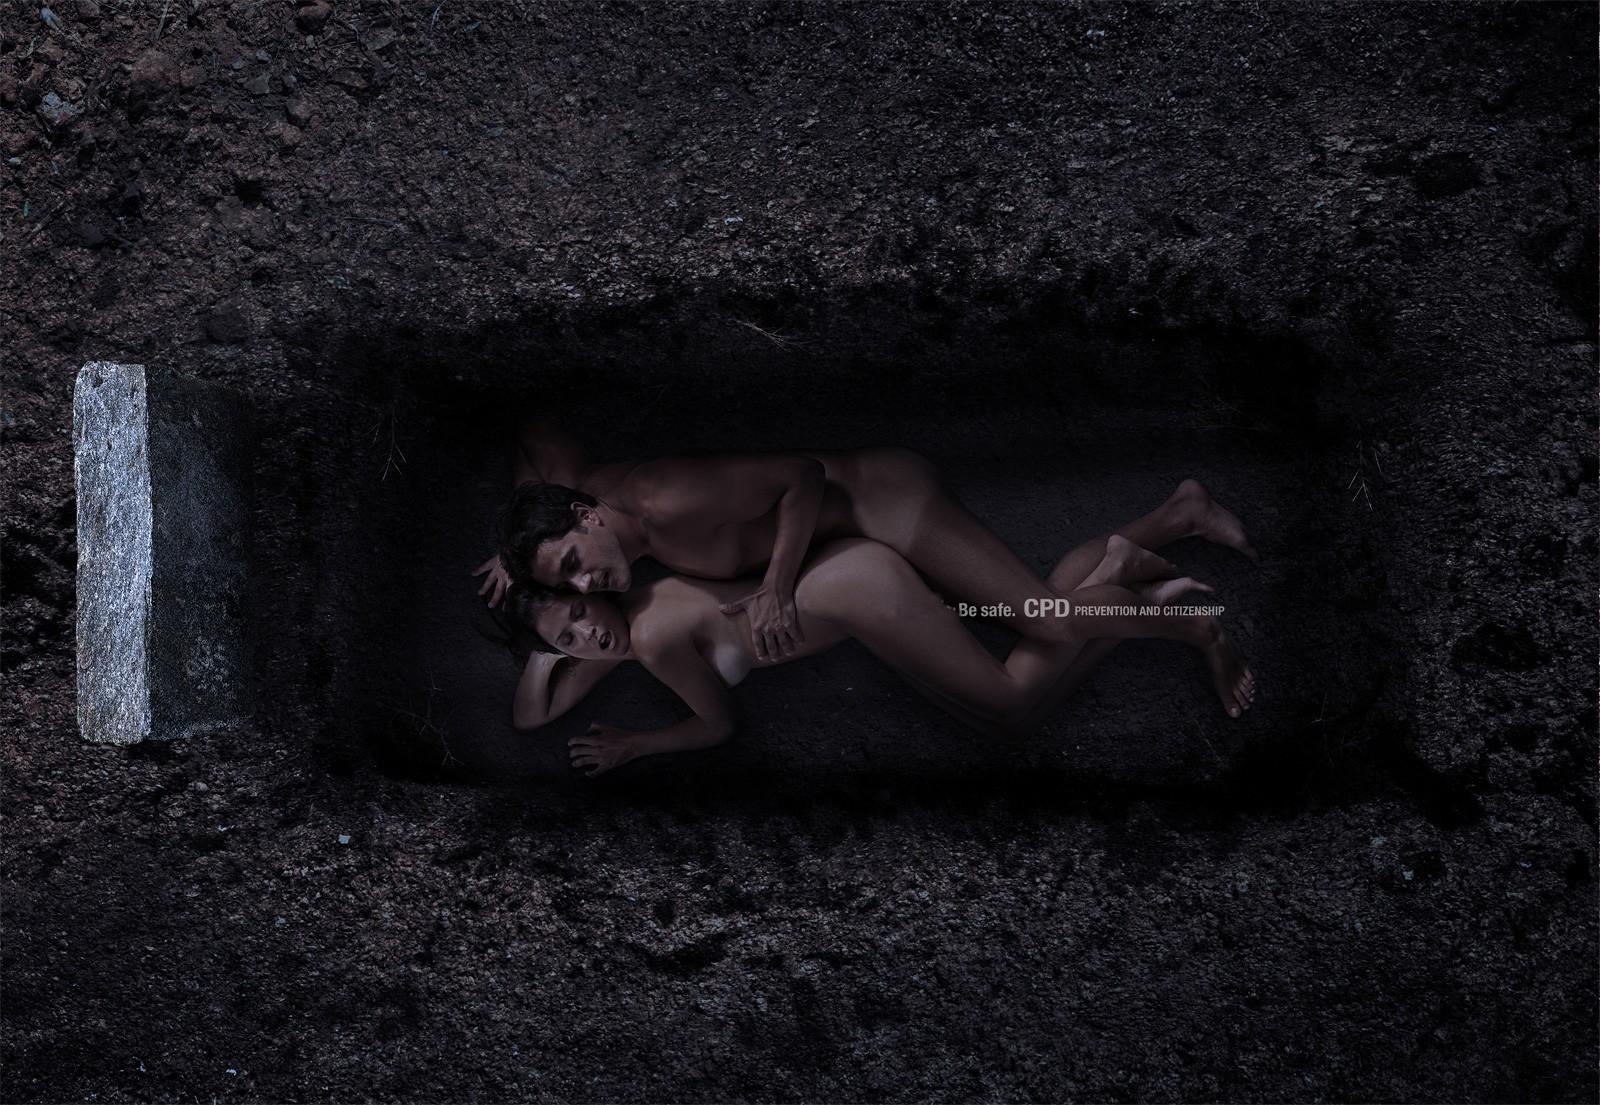 Секс на кладбище фото 5 фотография